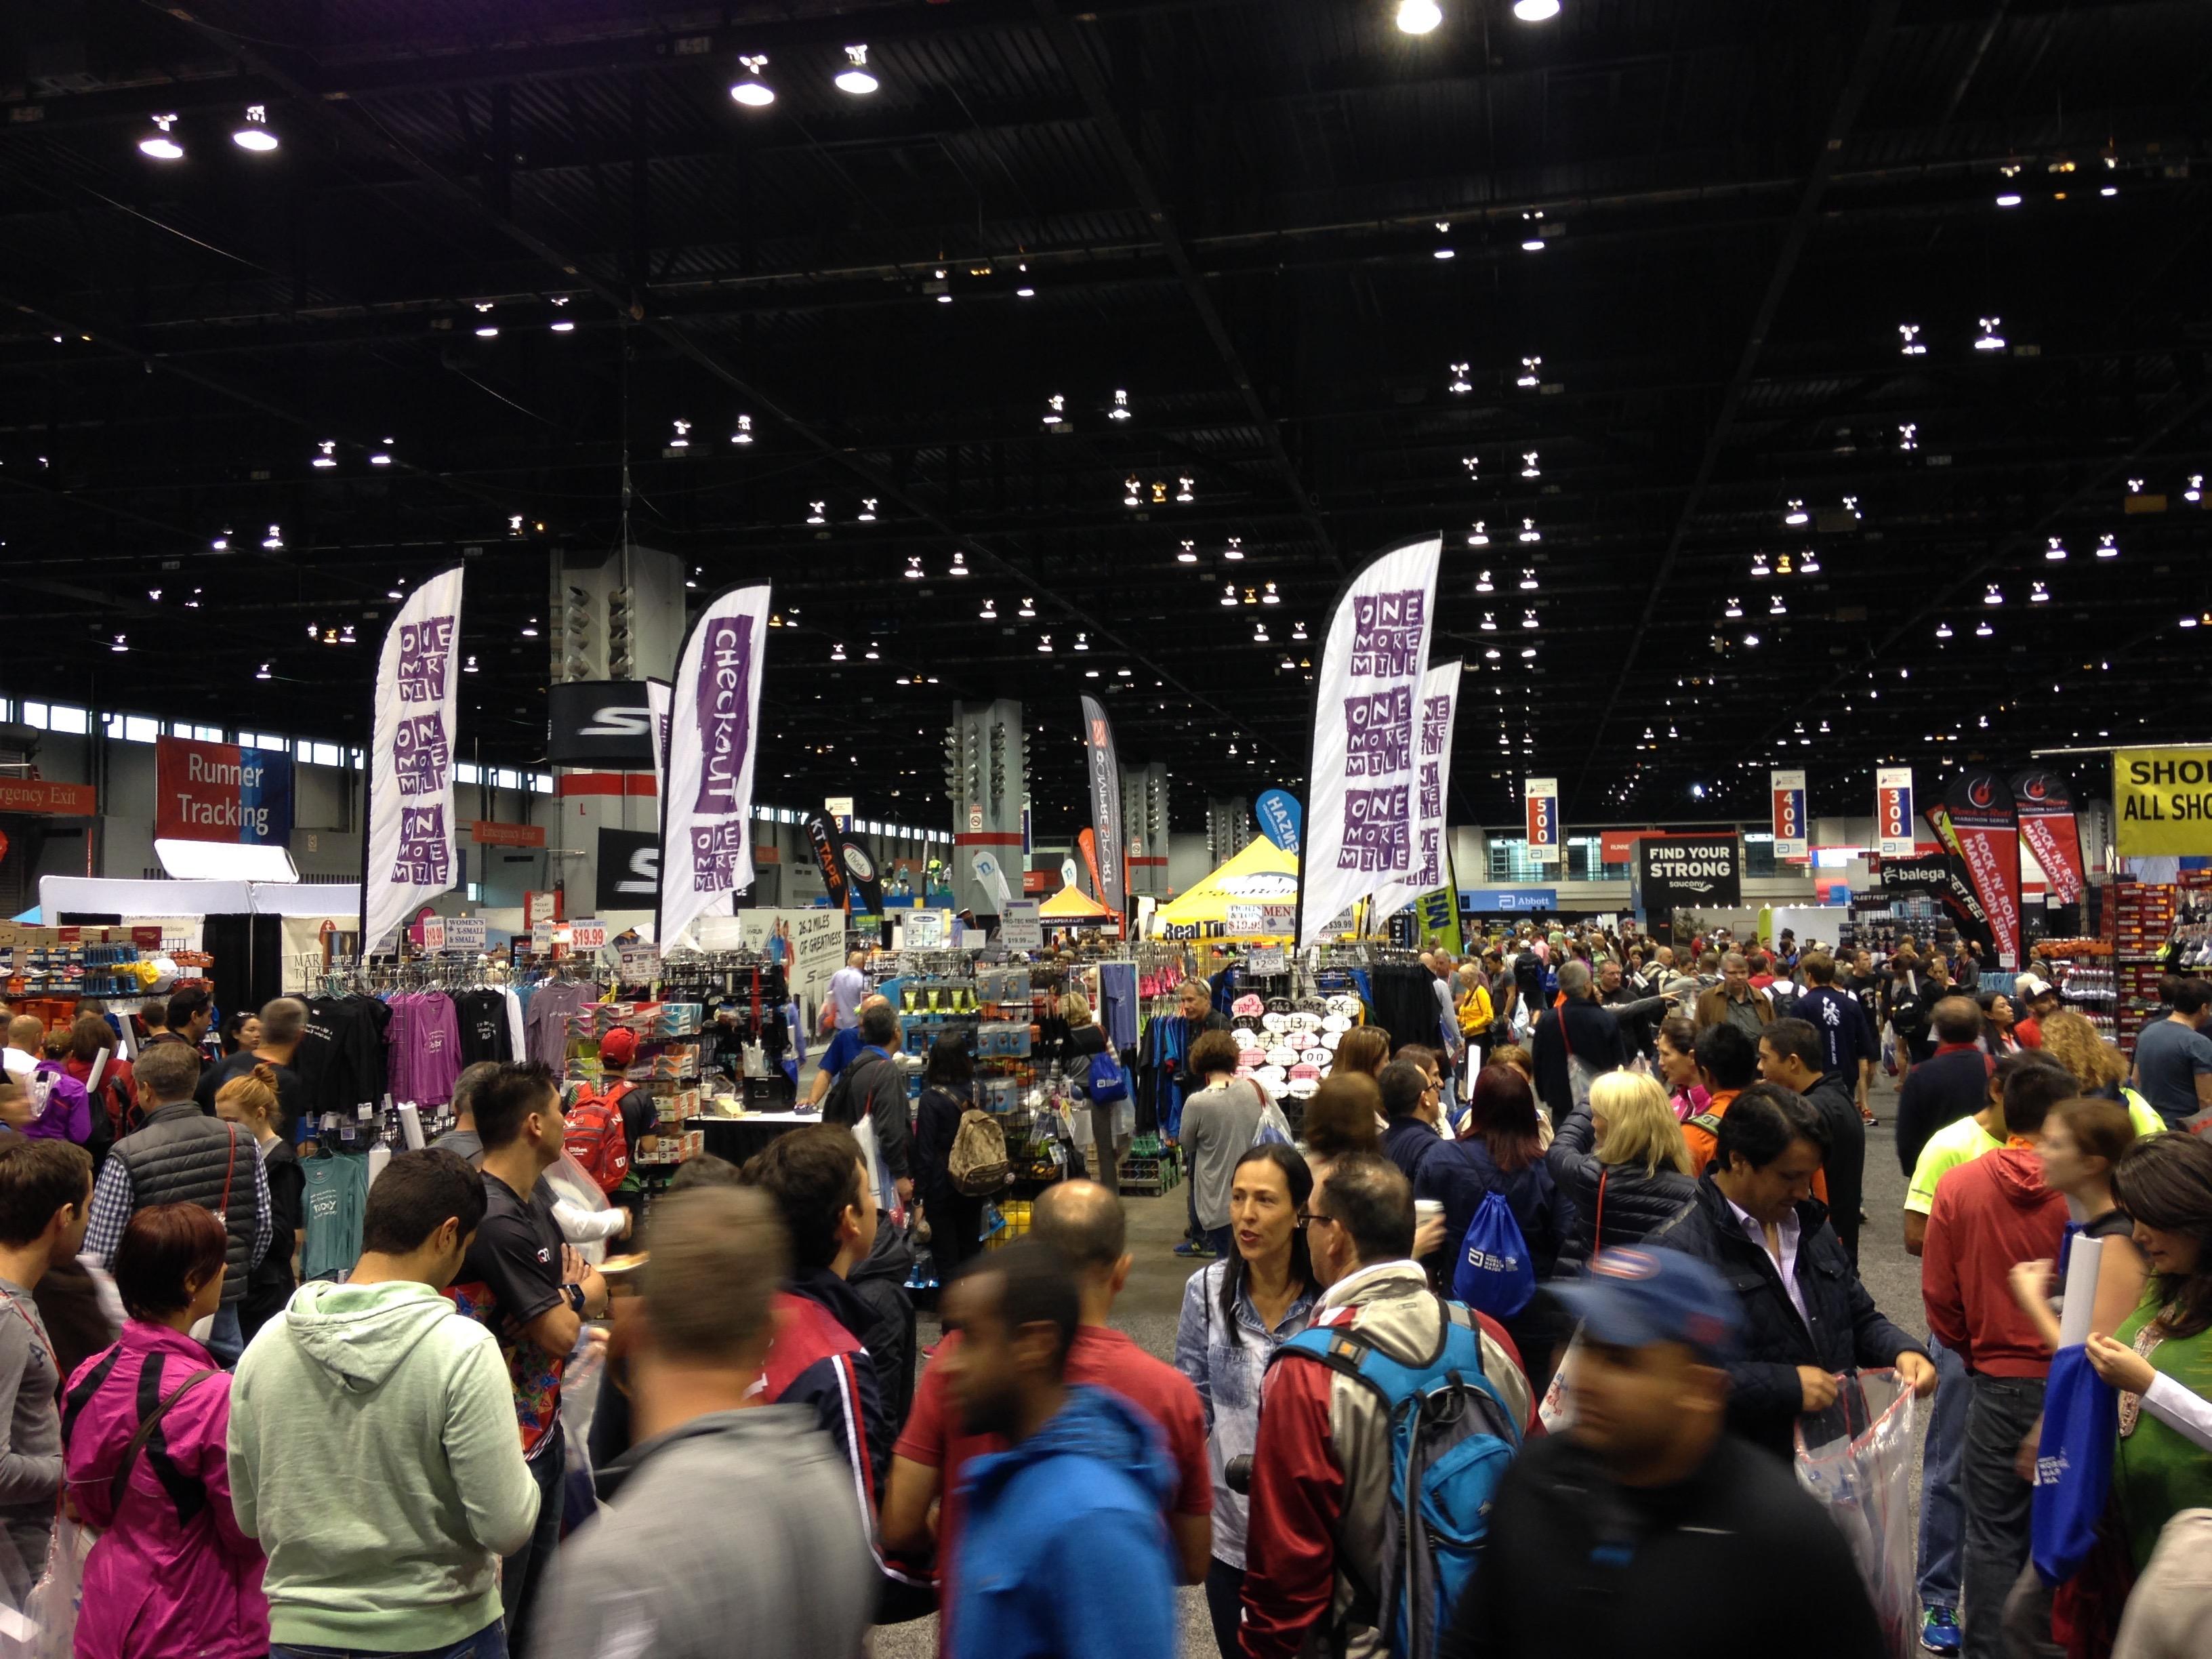 EXPO Chicago Marathon